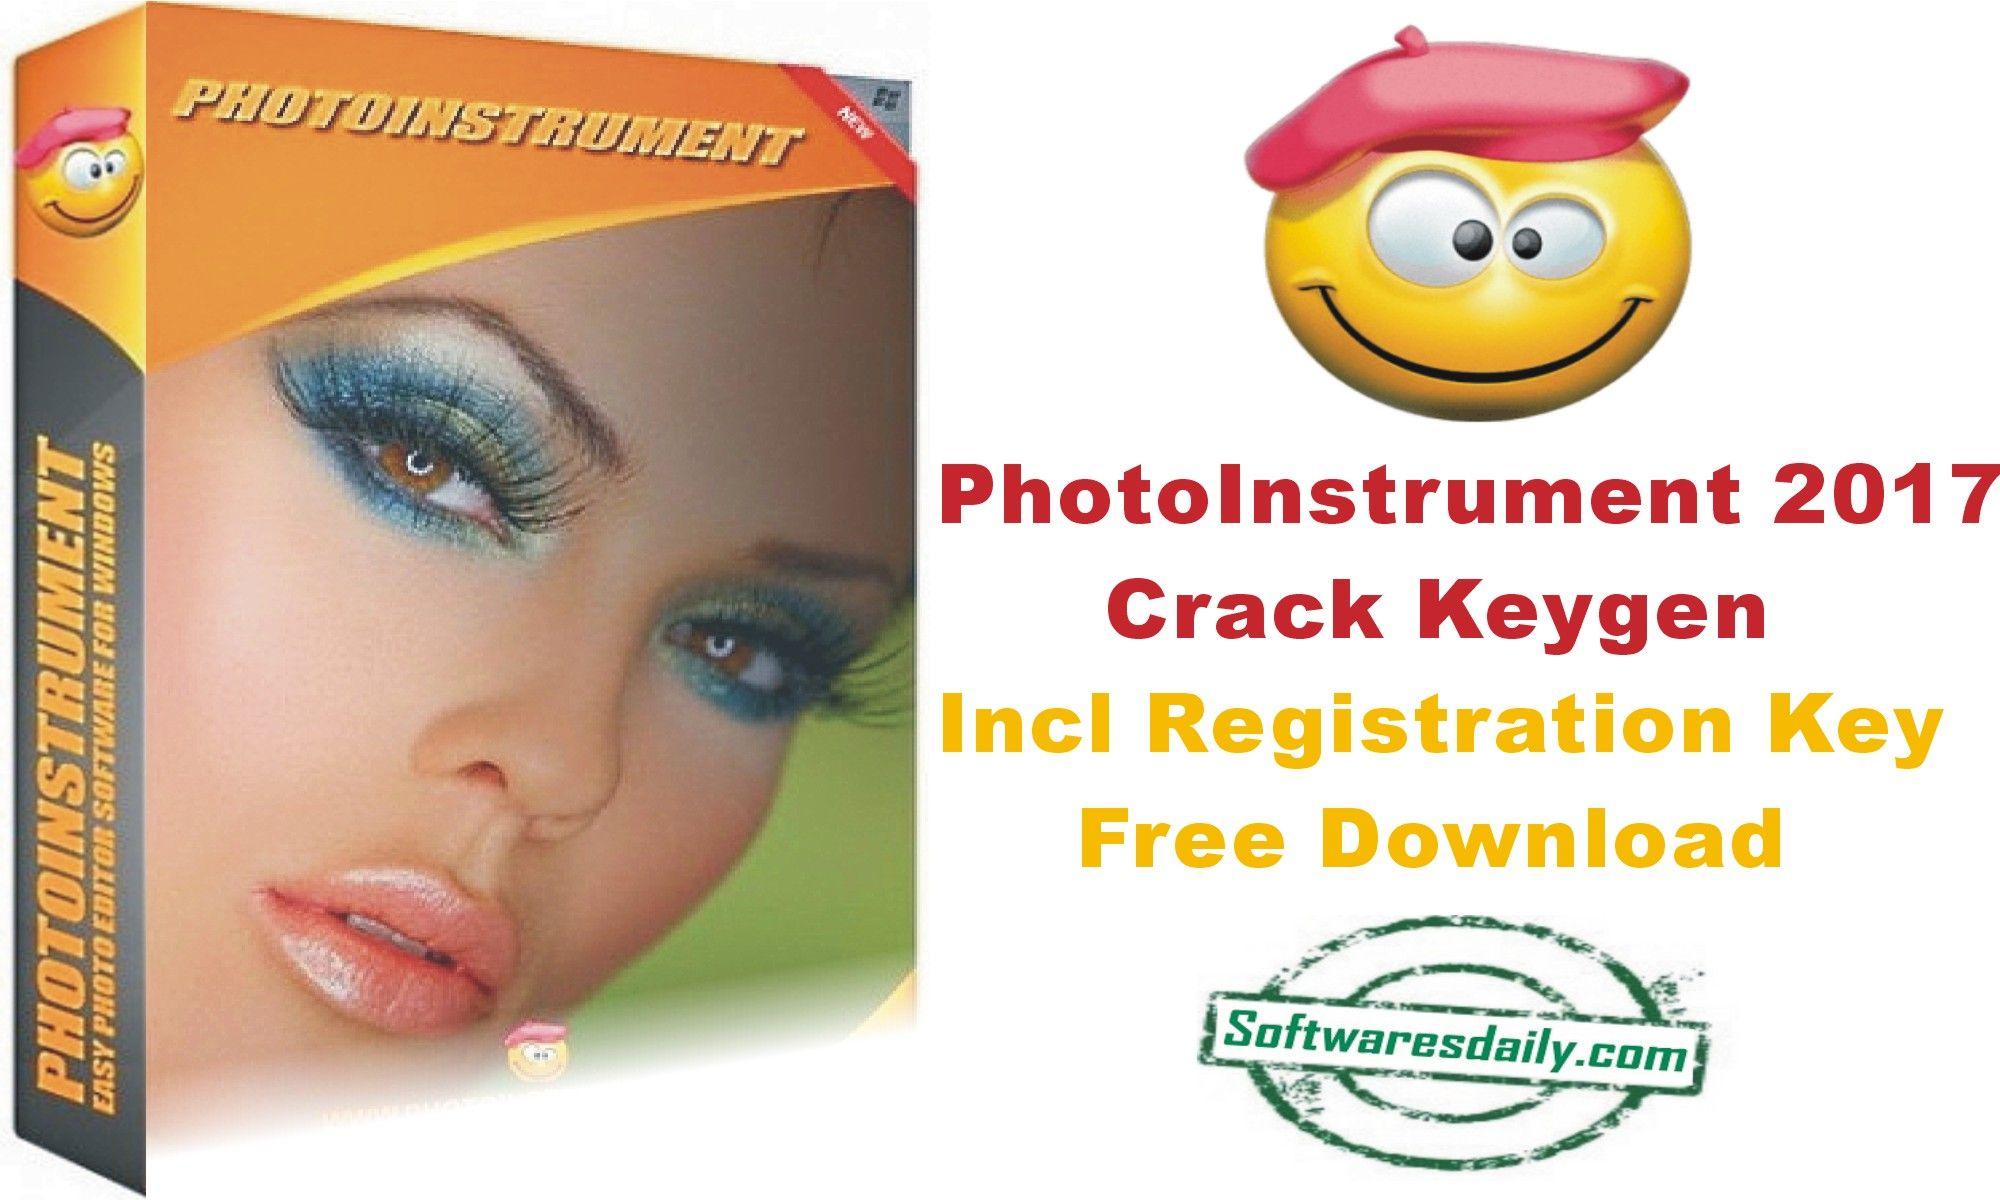 PhotoInstrument 2017 Crack Keygen Incl Registration Key Free Download, PhotoInstrument 2017 Crack Keygen PhotoInstrument 2017 Registration Key Free Download